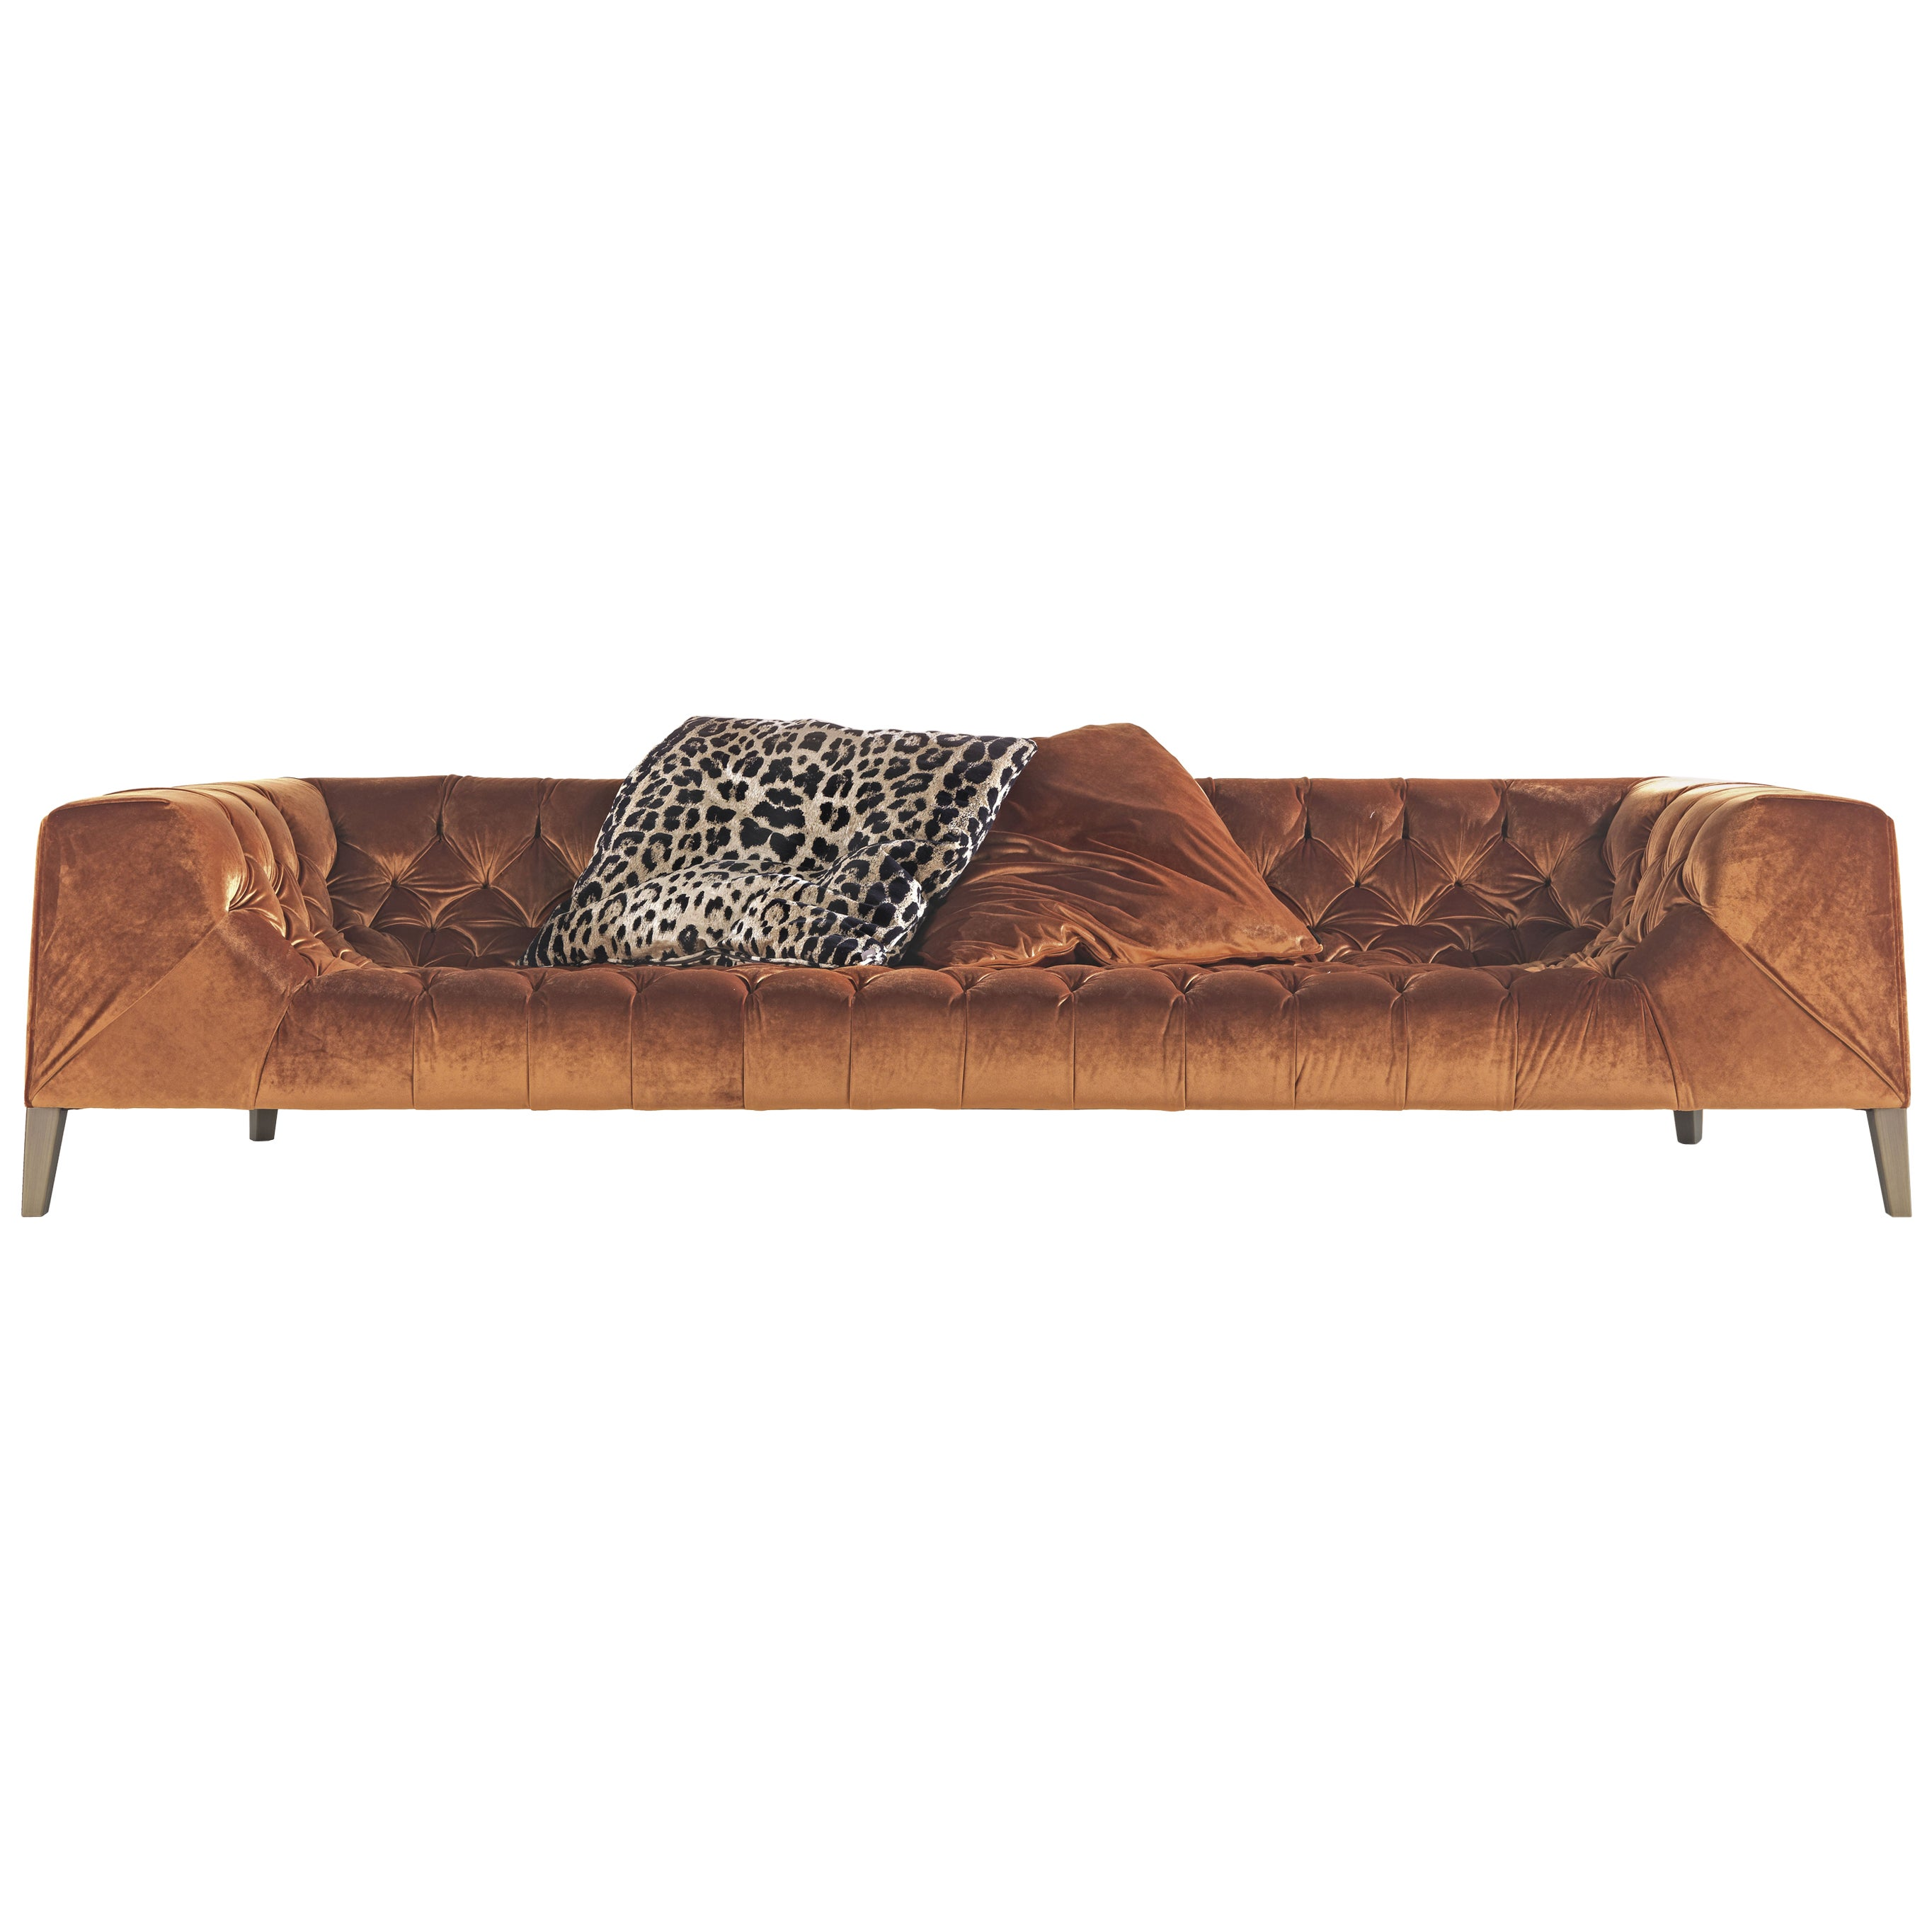 Blake 4-Seater Sofa in Fabric by Roberto Cavalli Home Interiors